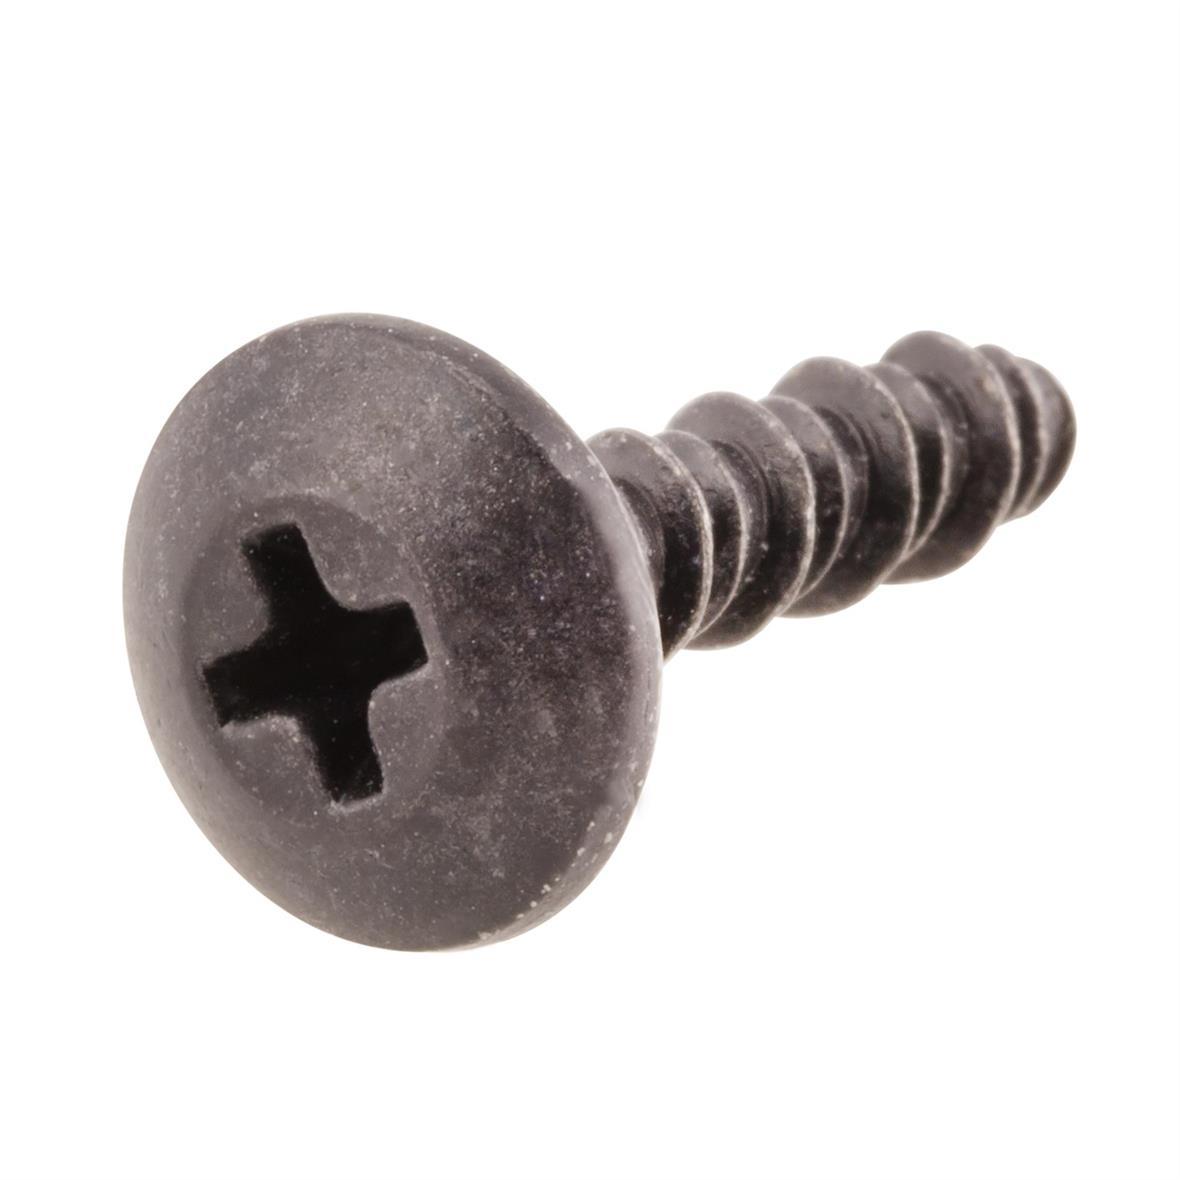 Product Image for 'Sheet Metal Screw air intake variatorcover 3,8x16 mm, cross recess, raised head, PIAGGIOTitle'